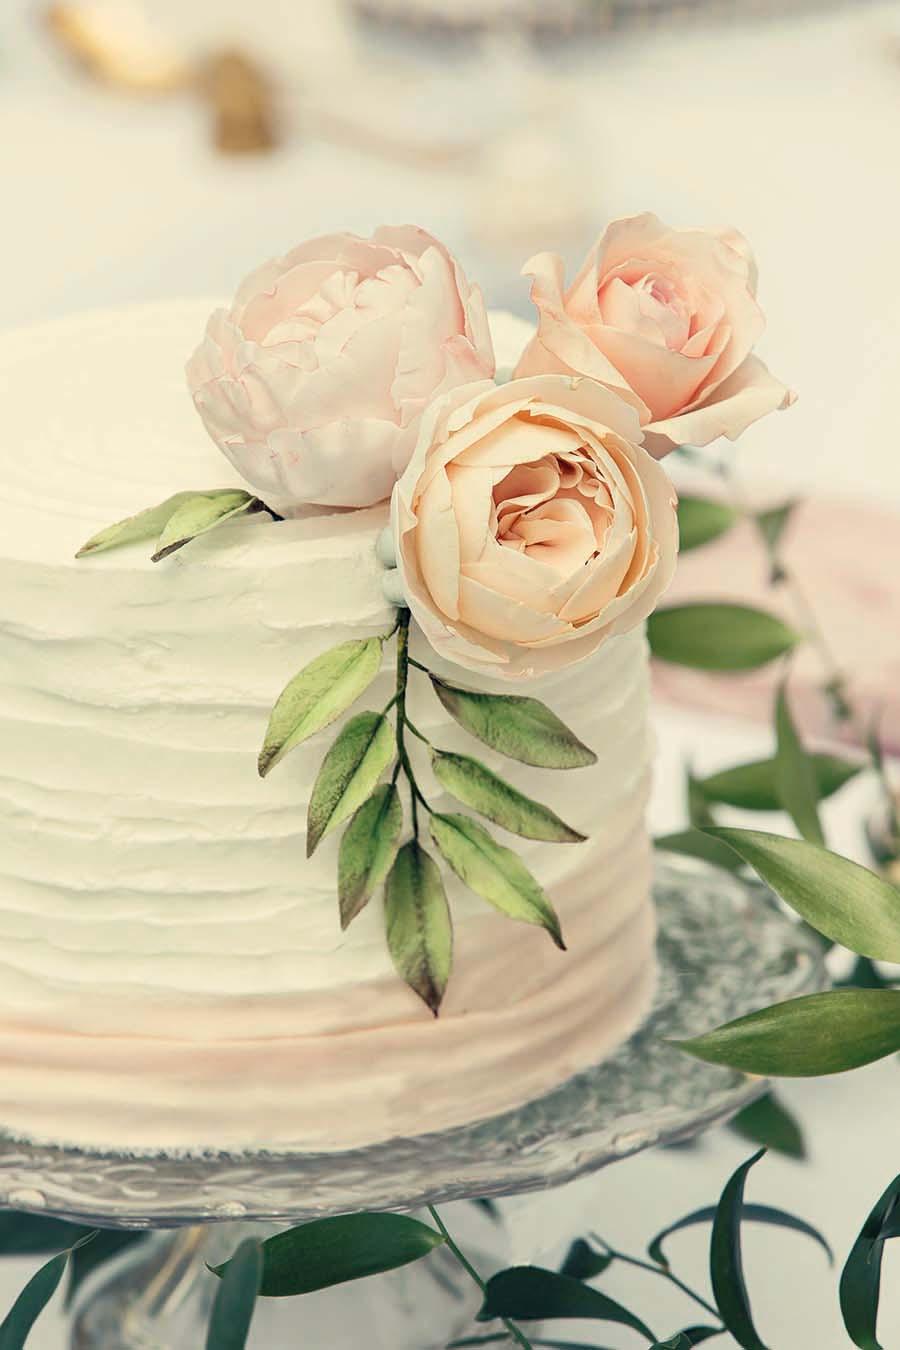 Buckinghams Wedding Magazine – Hodsock Photoshoot 2018 – Dottie Photography (63)